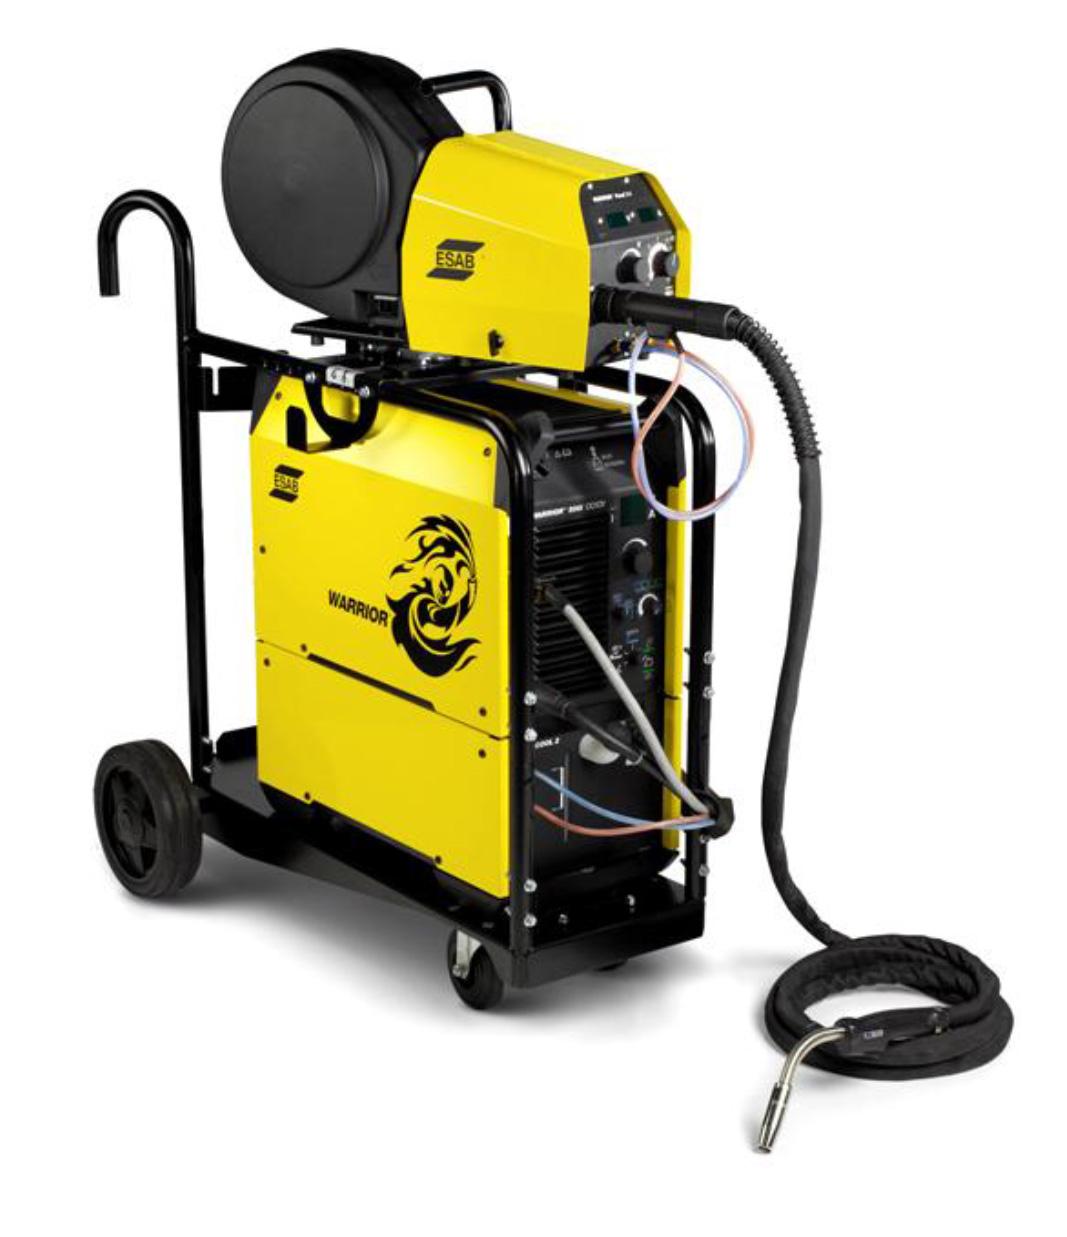 ARSA Welding & Machinery Equipment Trading L L C